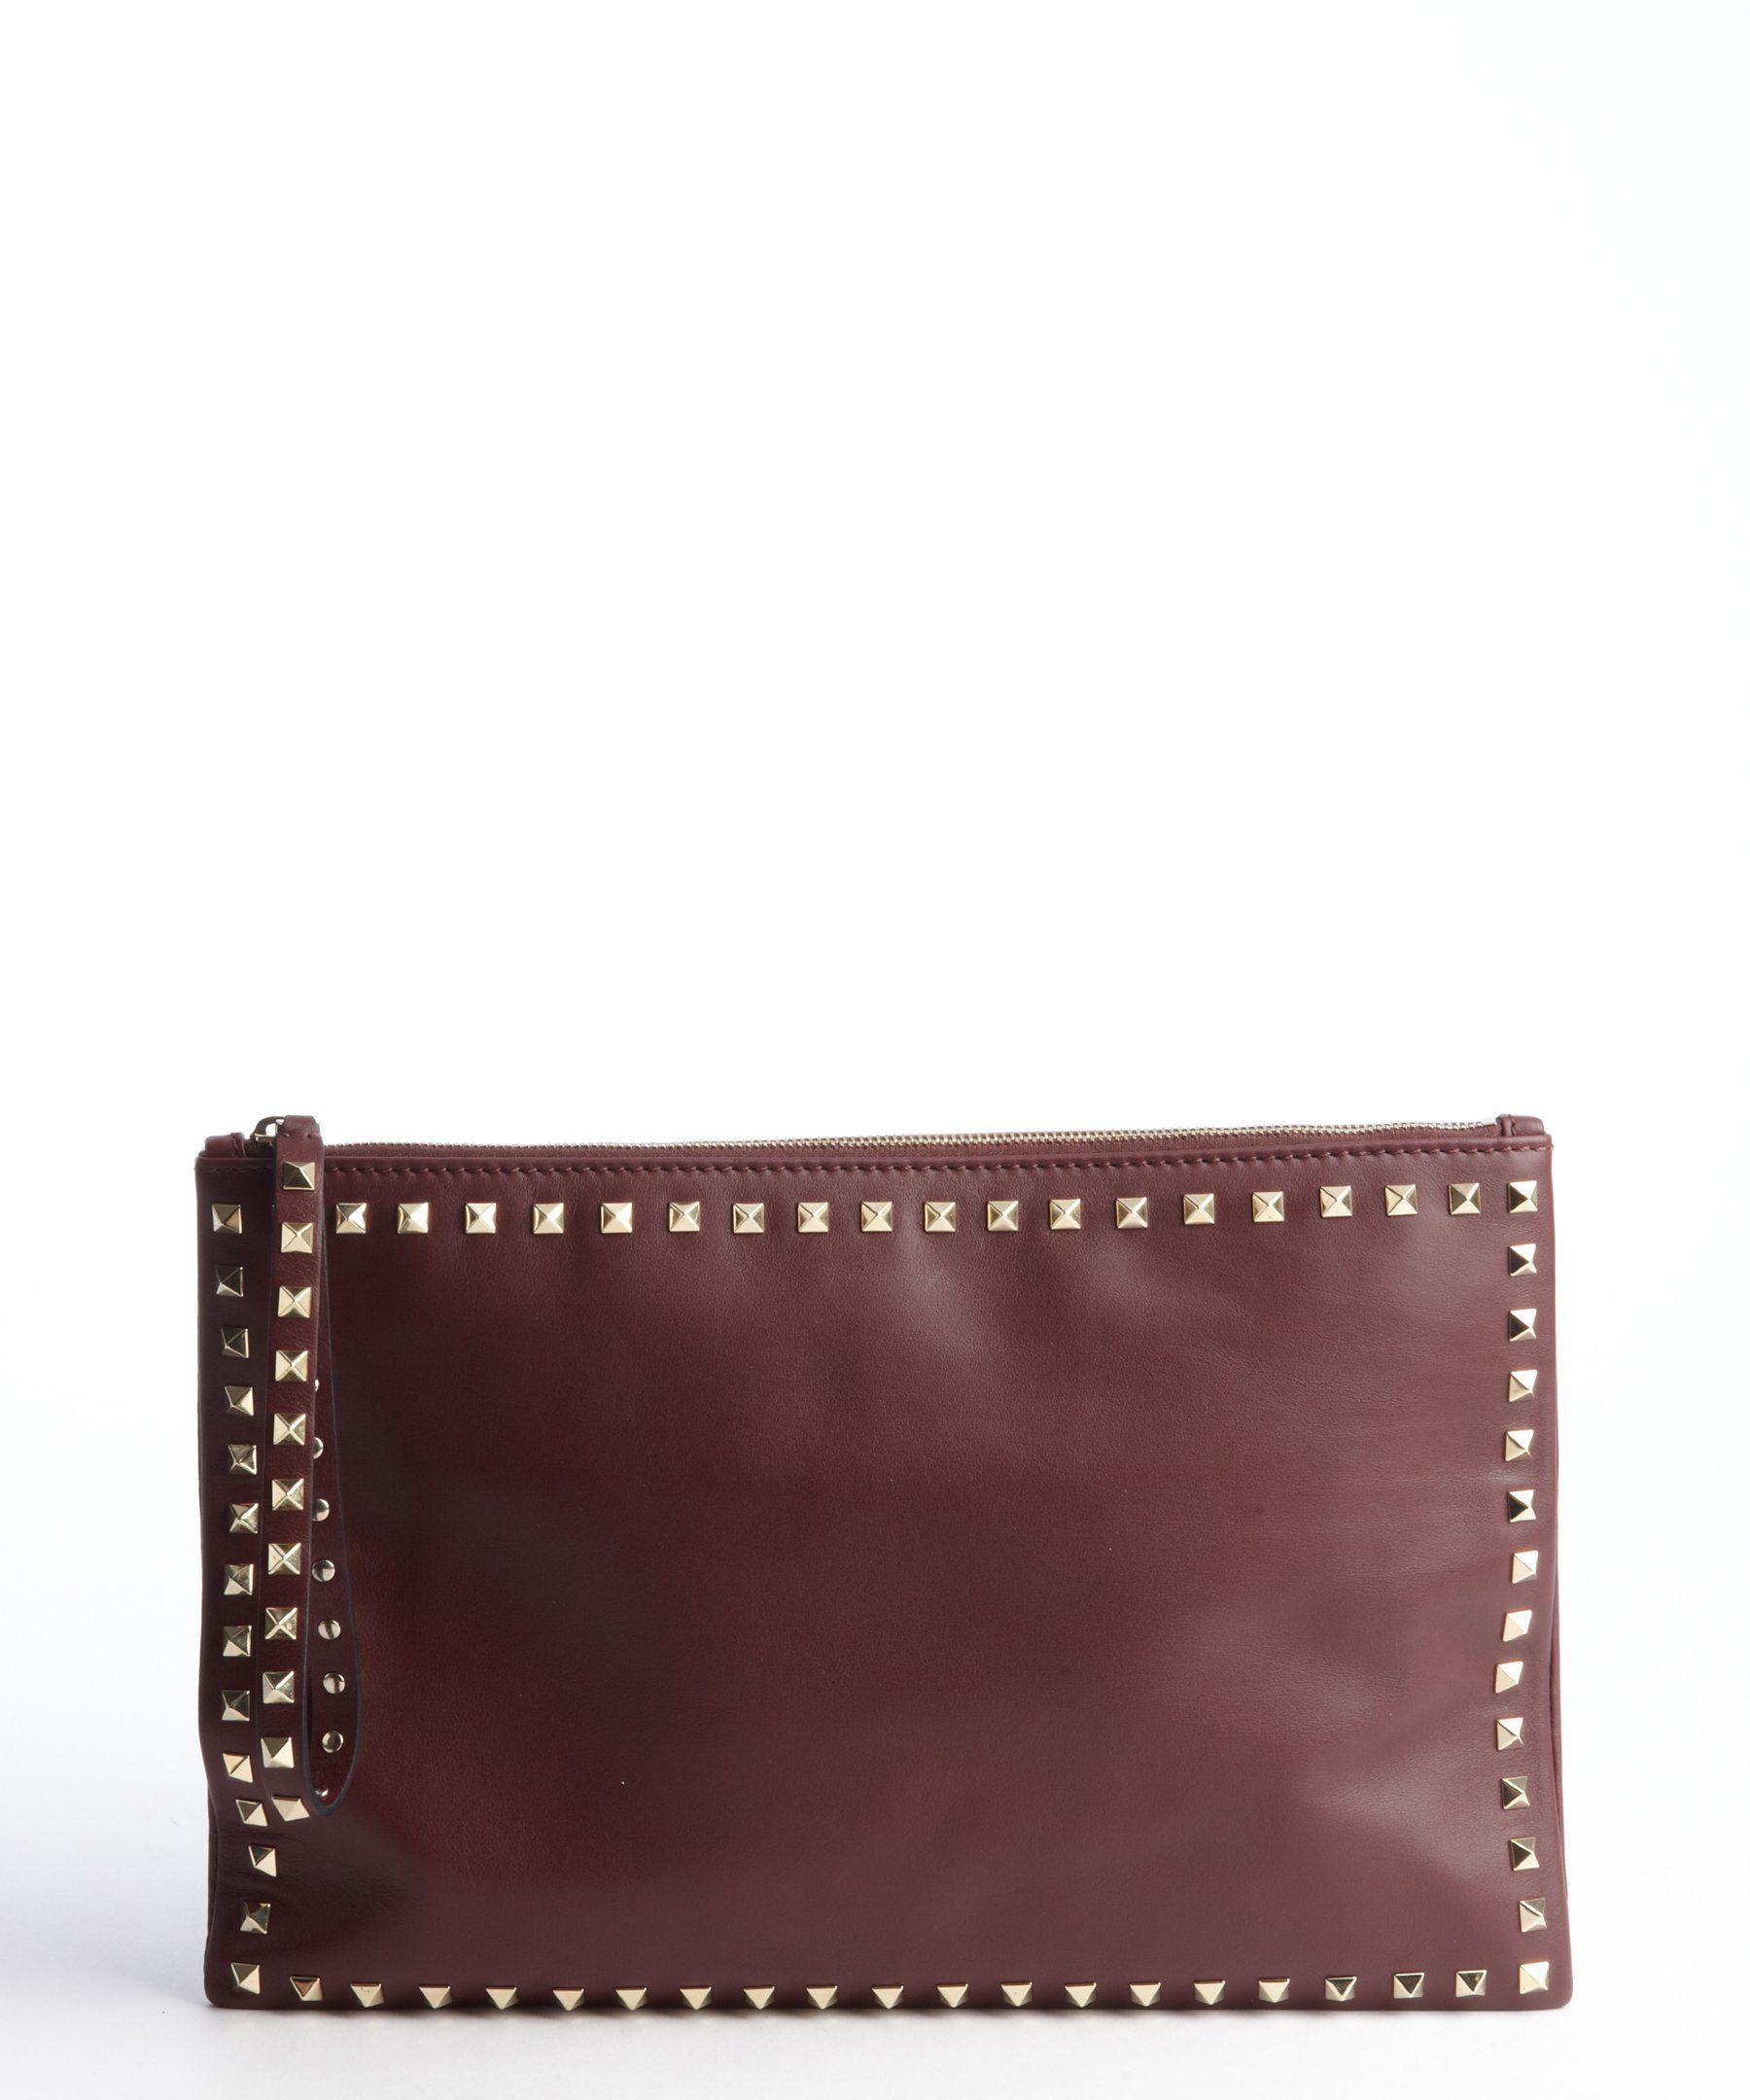 Valentino ruby leather studded large wristlet clutch | BLUEFLY up to 70% off designer brands